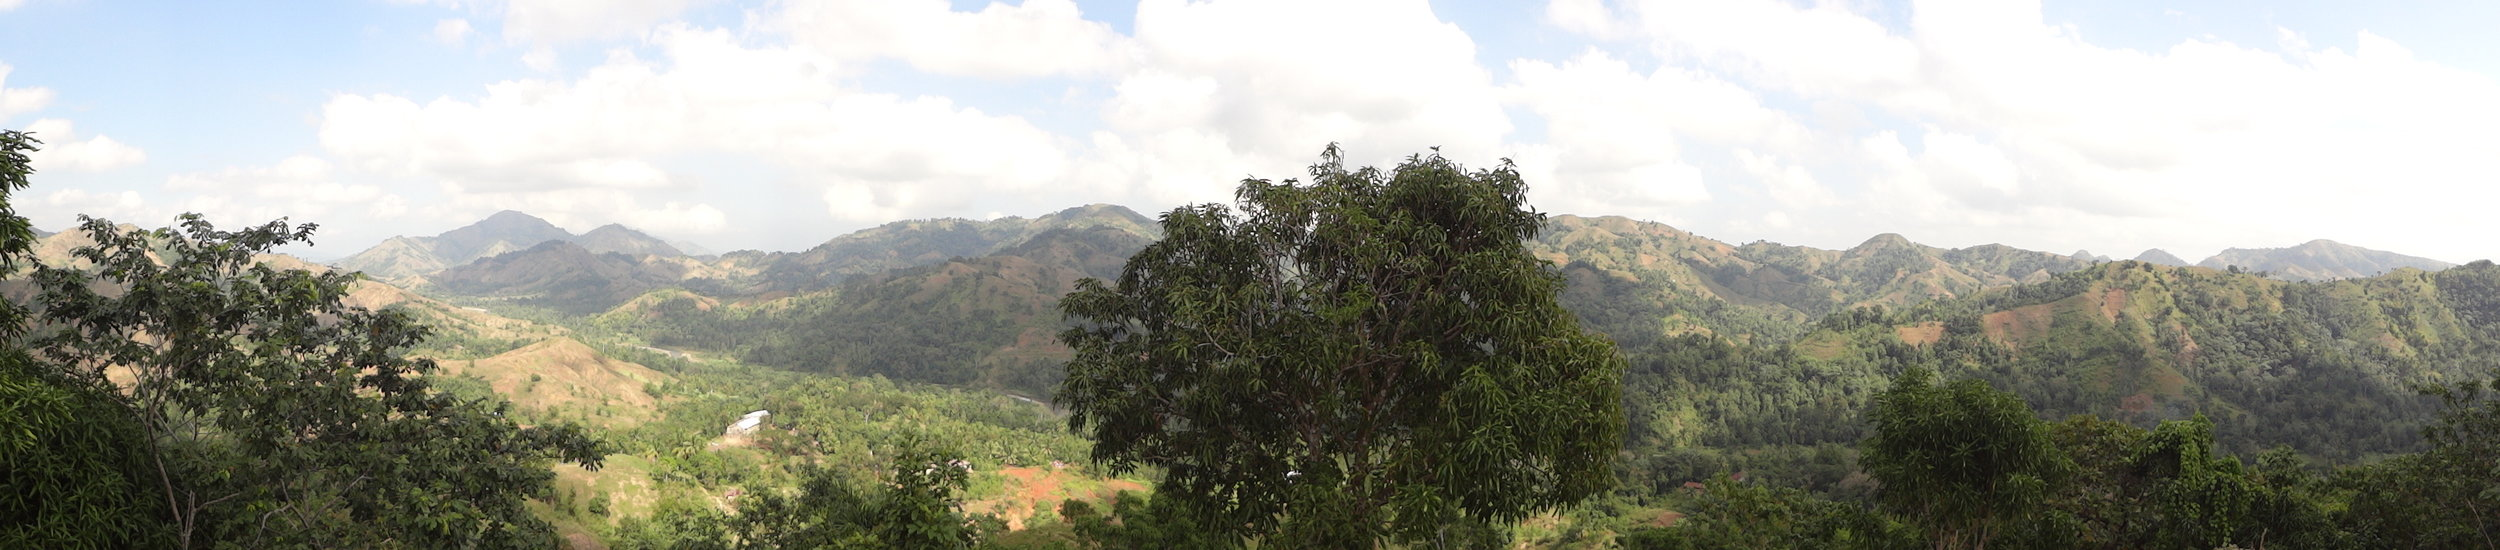 Mountains around the health center near Soufriere.